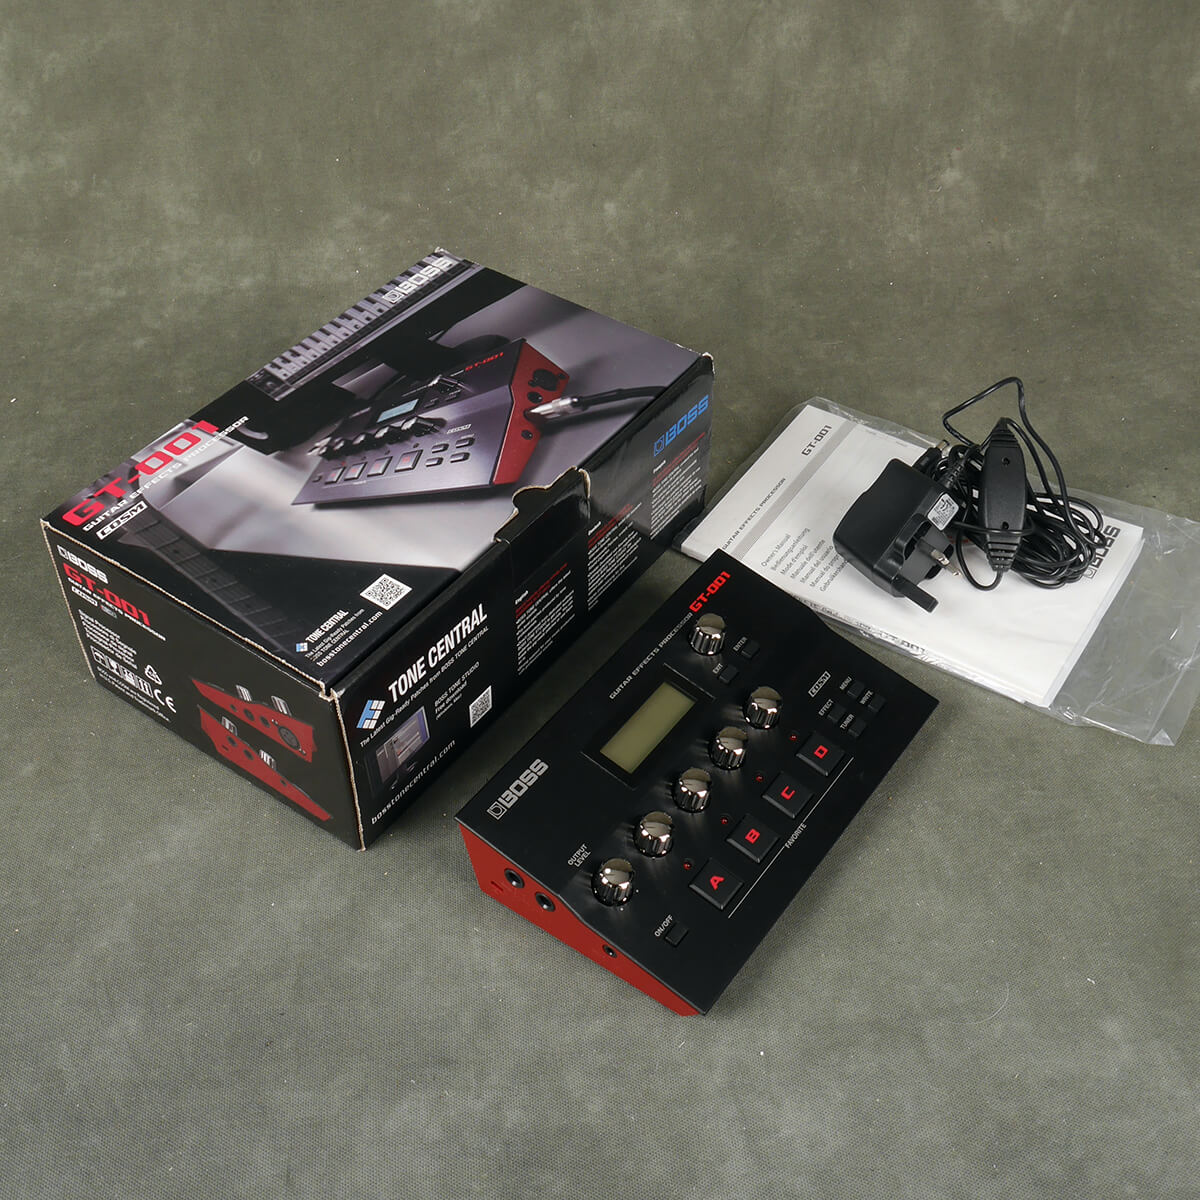 Boss GT-001 Guitar Multi FX Pedal w/Box & PSU - 2nd Hand